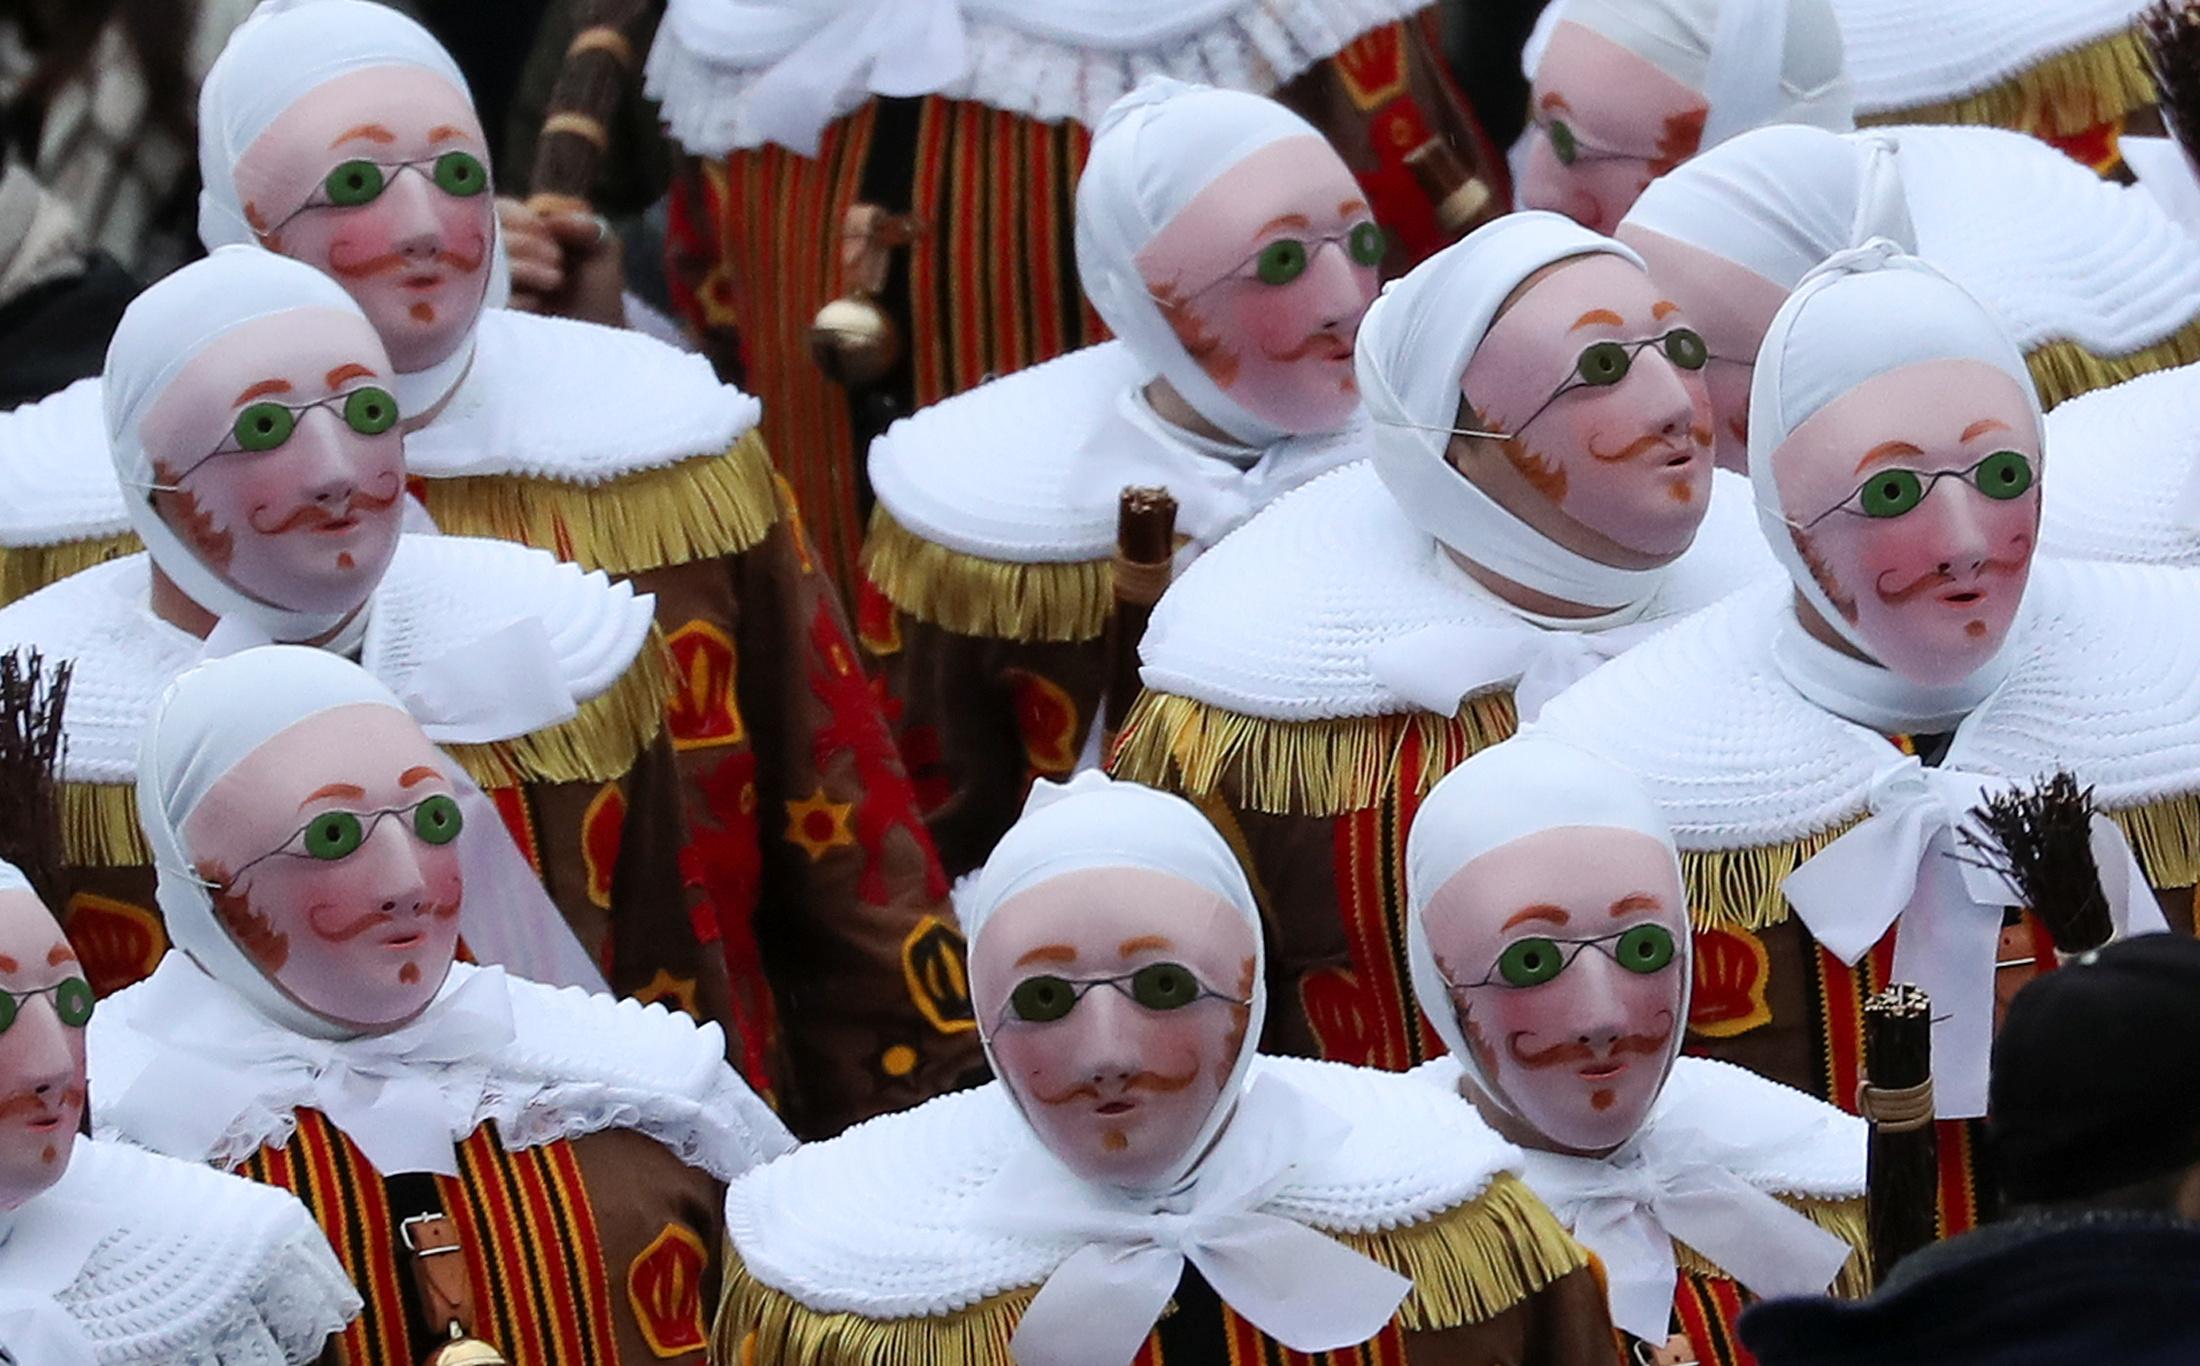 Binche carnival, REUTERS/Yves Herman